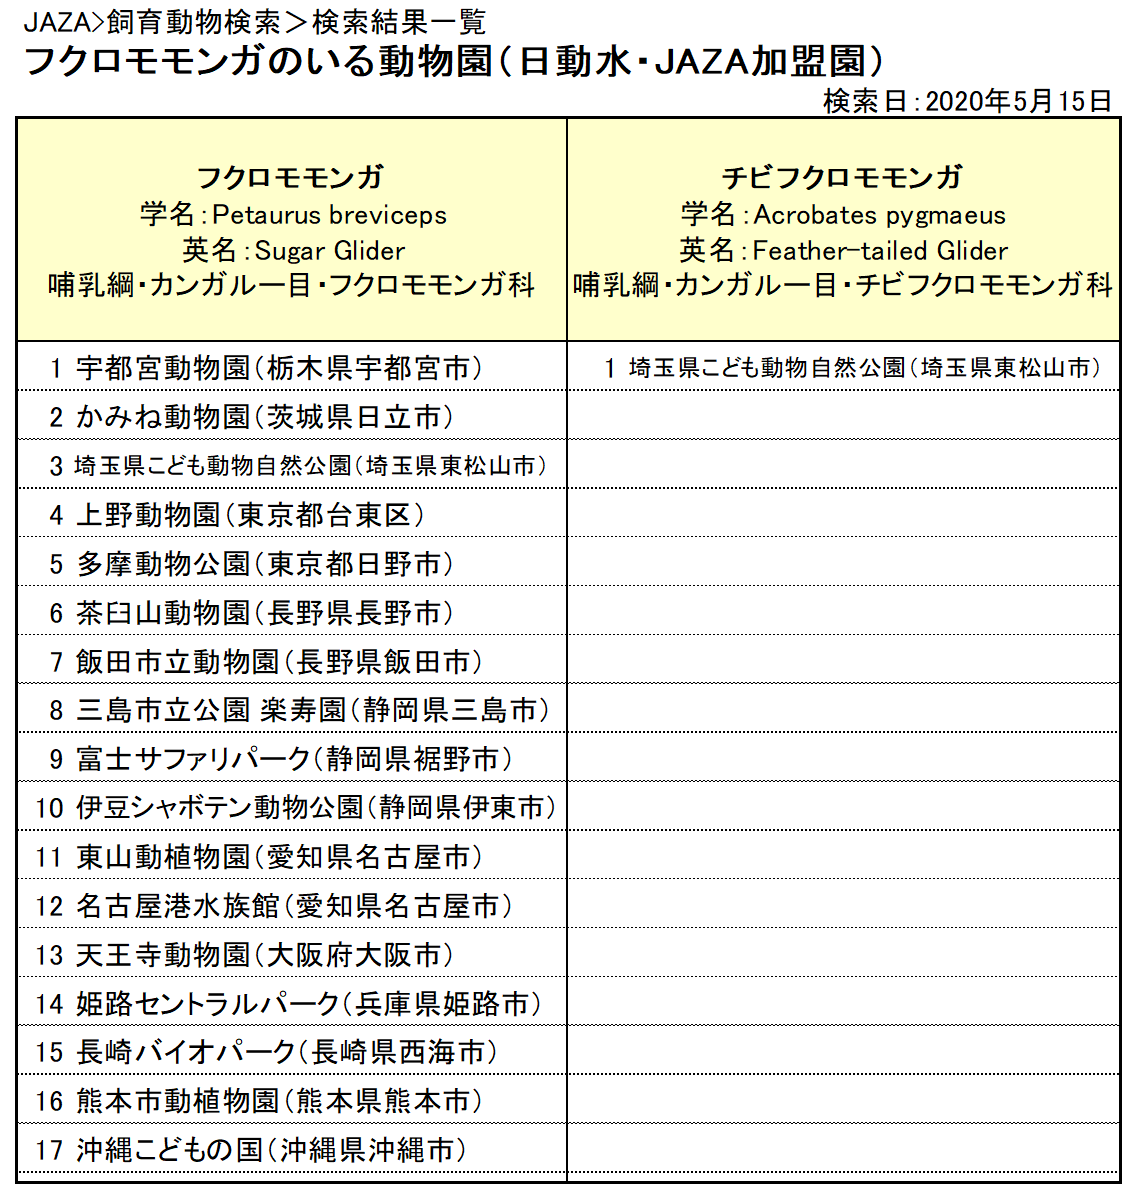 f:id:tsukunepapa:20200515071509p:plain